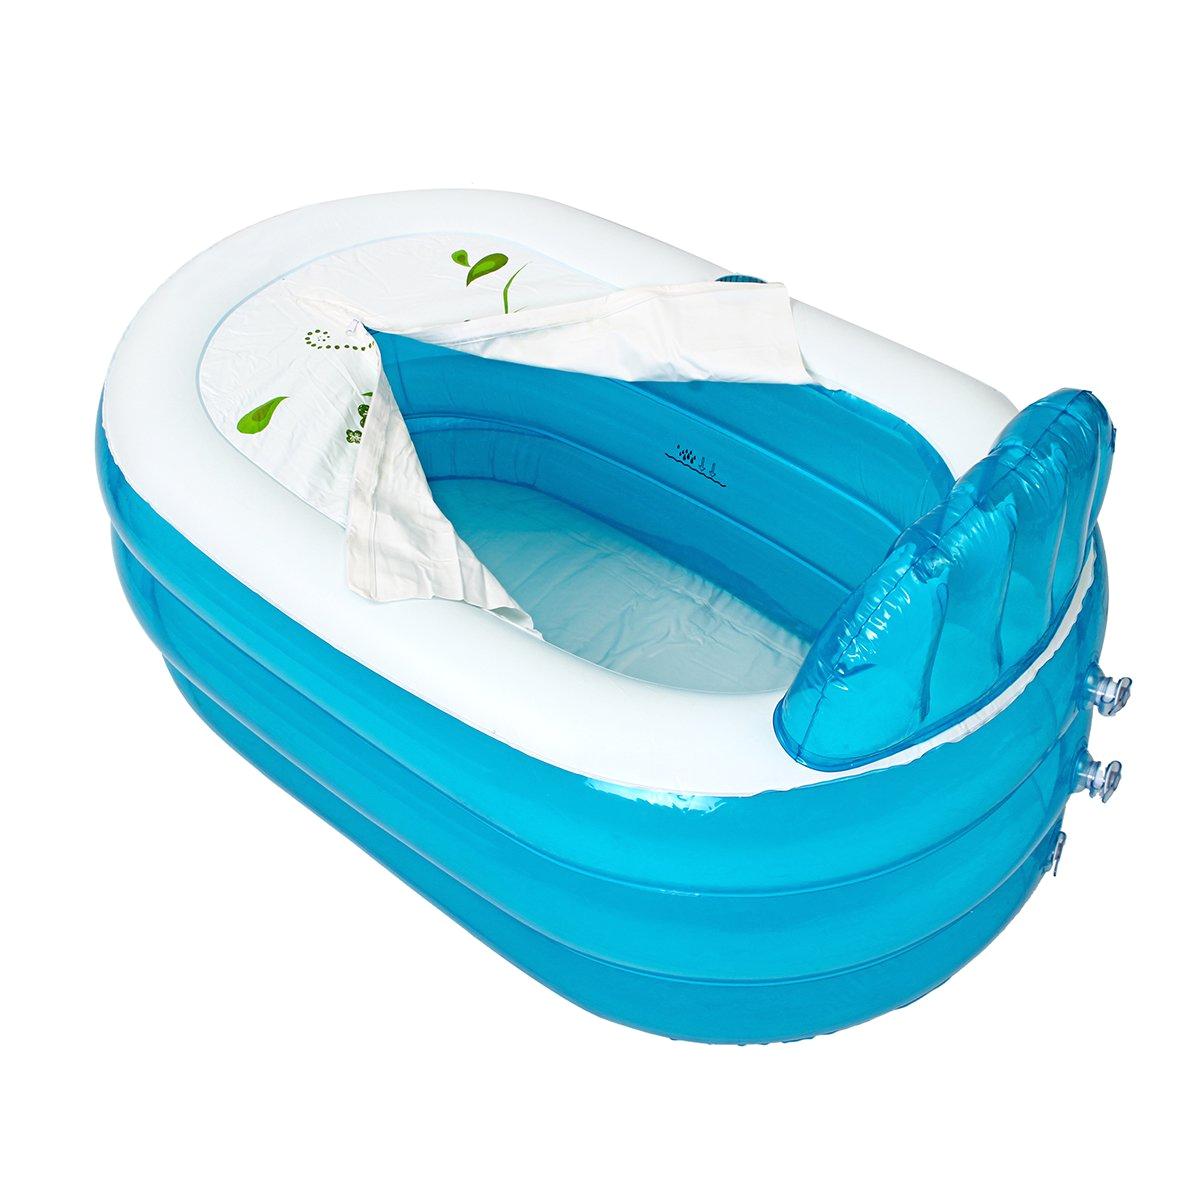 inflatable bathtub portable bath tub pvc camping travel folding spa bath with cushion pipe